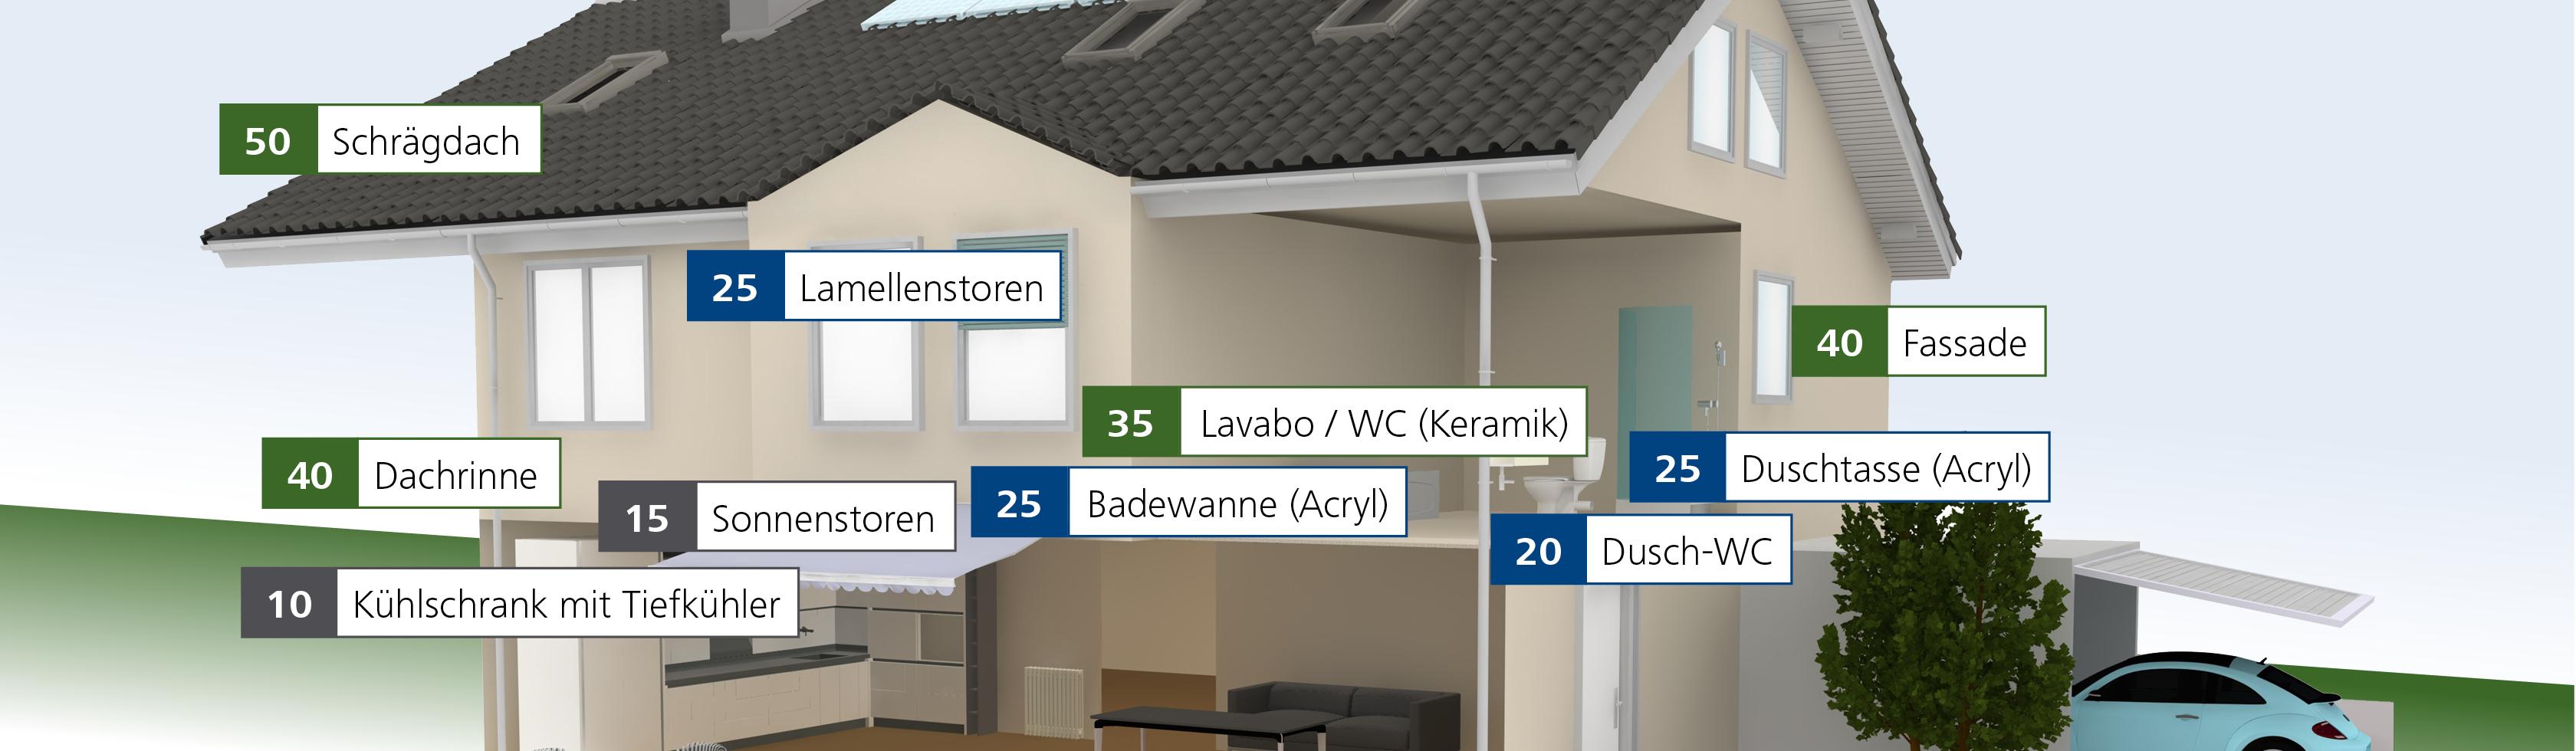 Lebenszyklus Immobilien